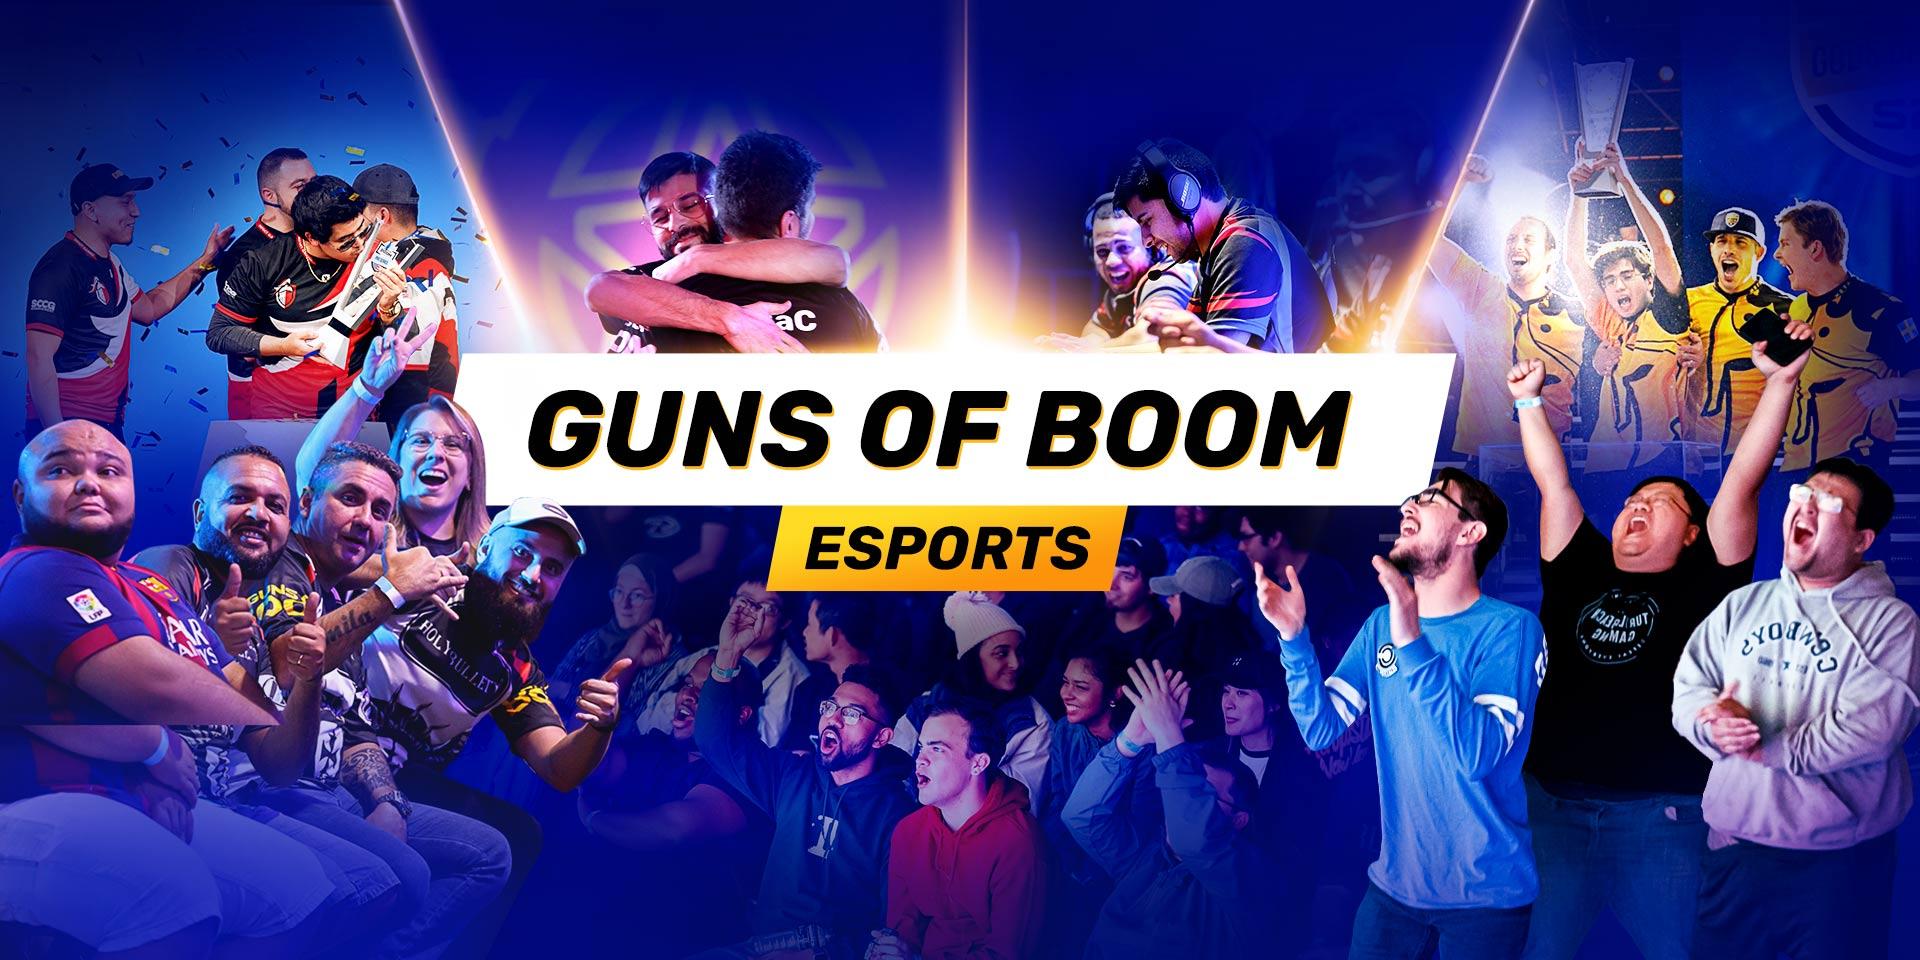 609c114faa334_esports-logo-update_article_header